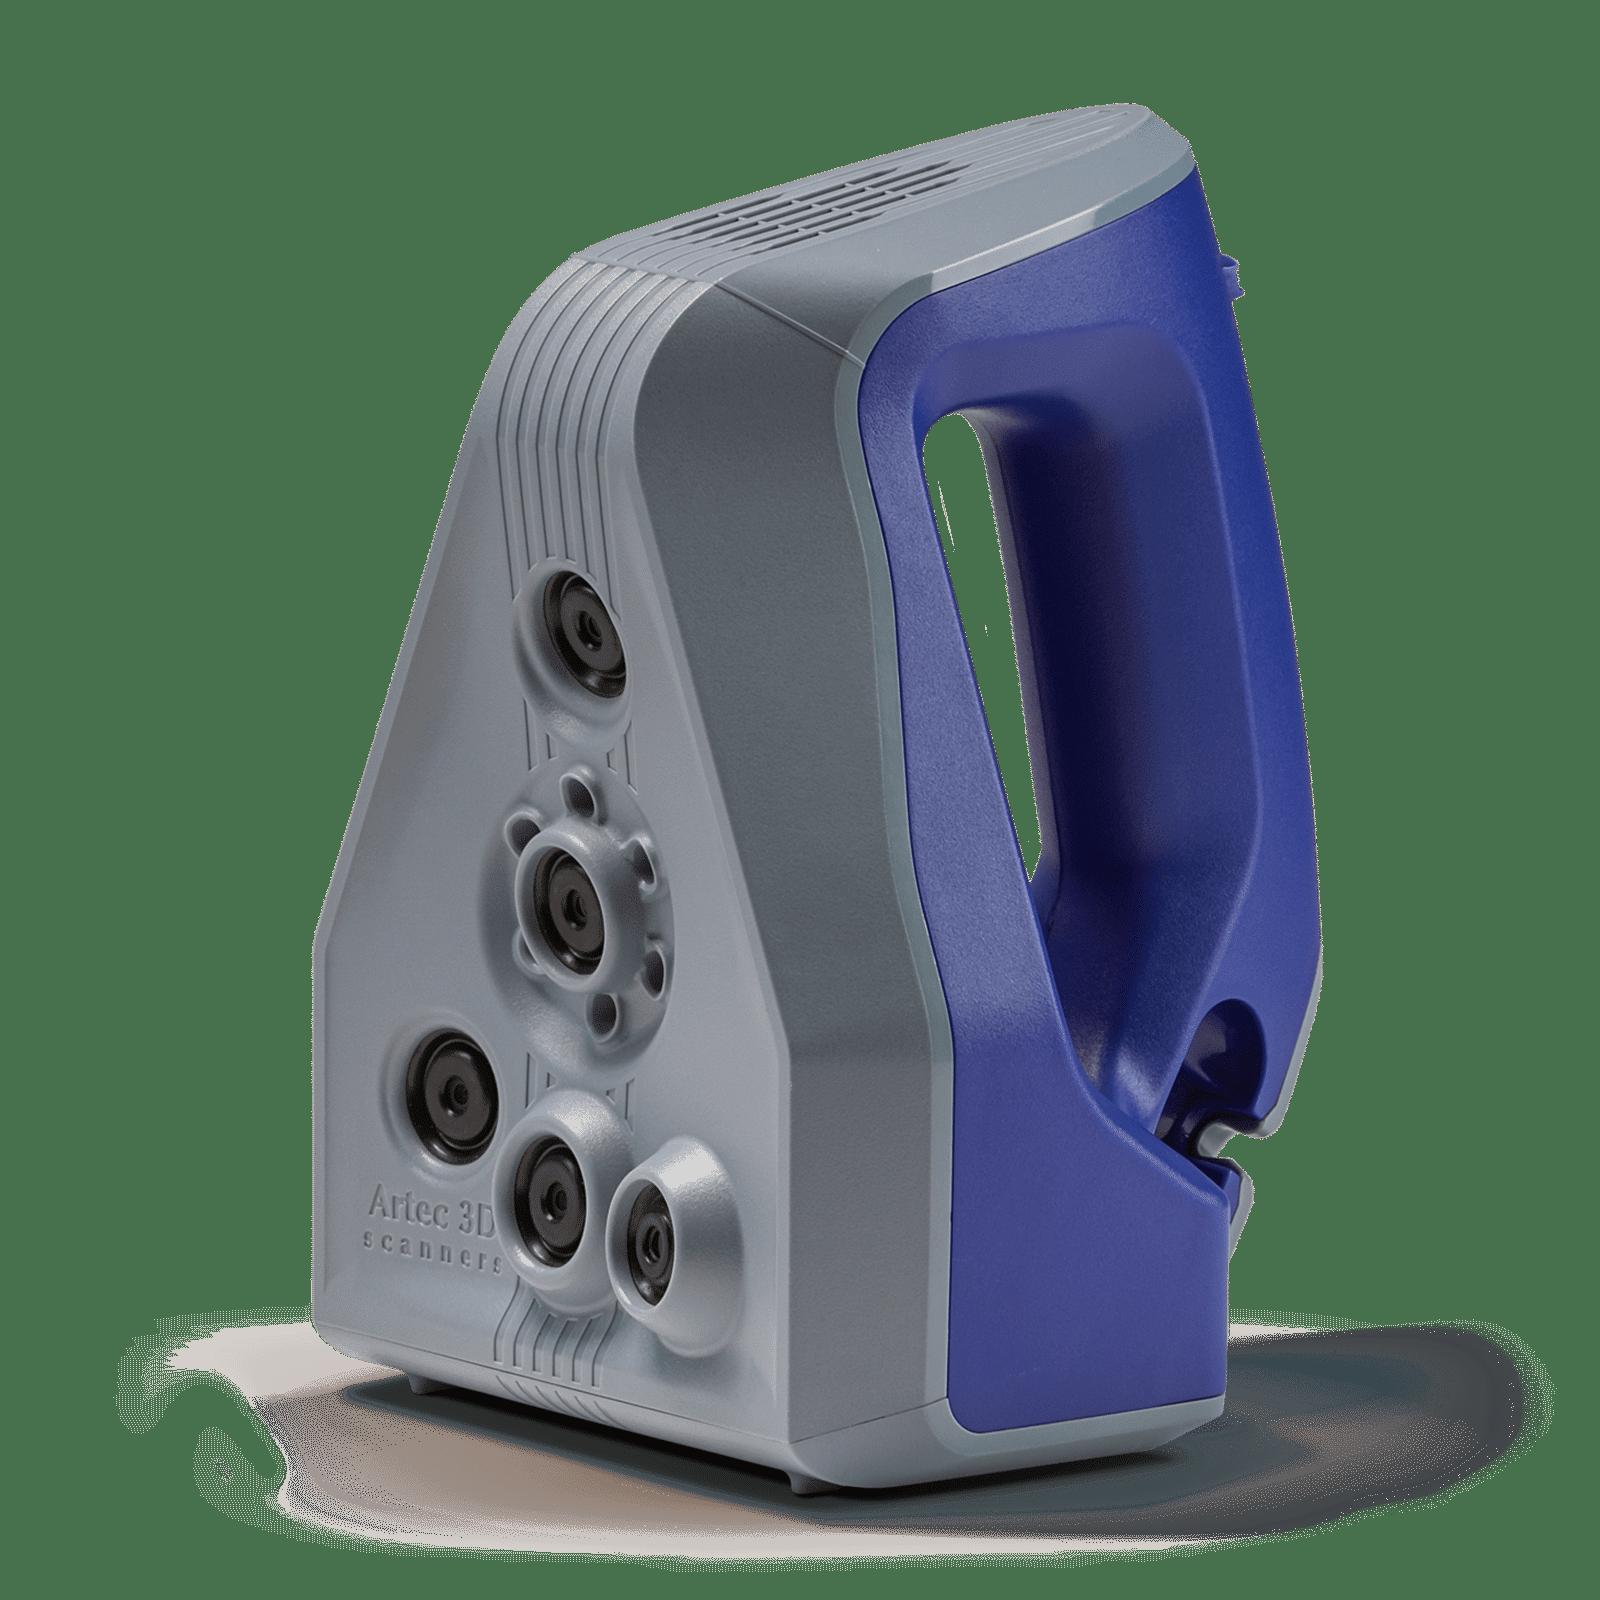 Artec Space Spider 3D Scanner